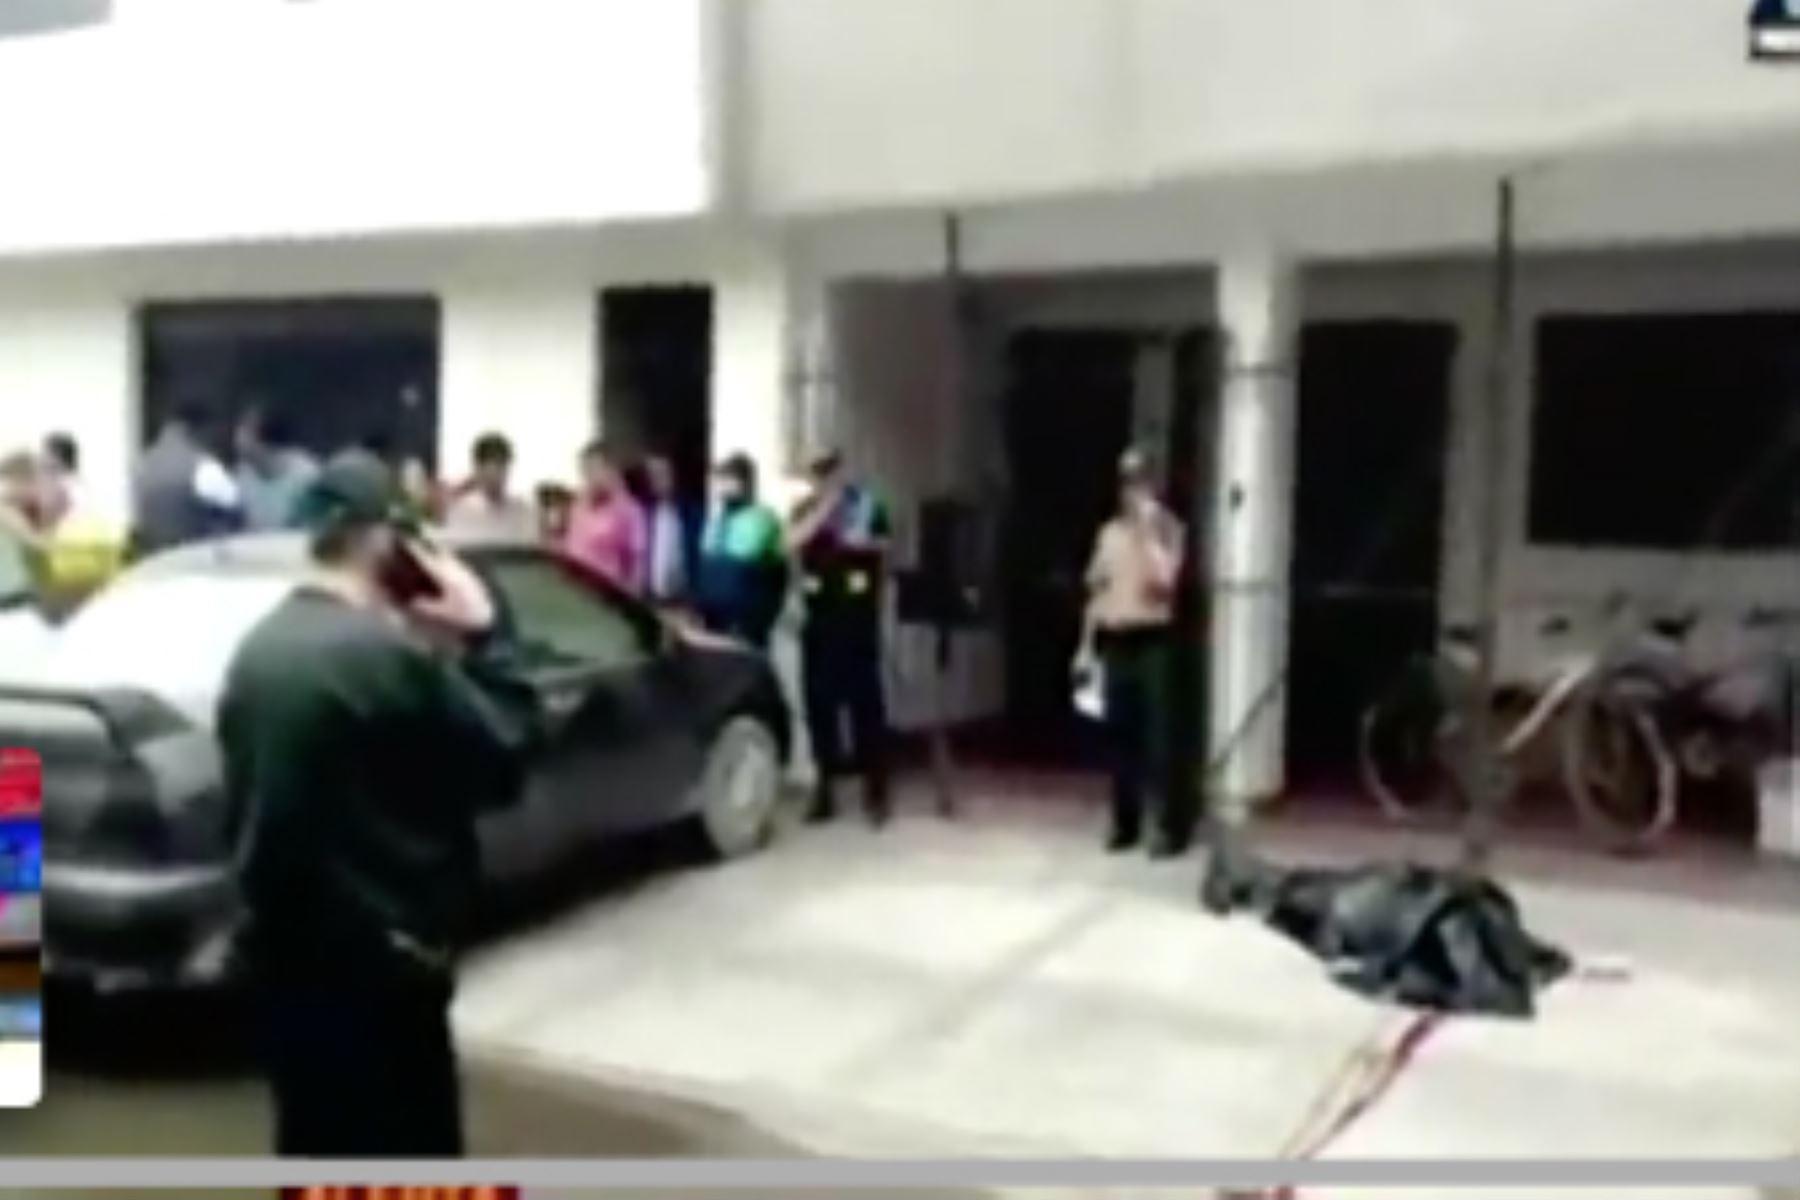 Matan a disparos a padre e hija de 2 años — Santa Anita